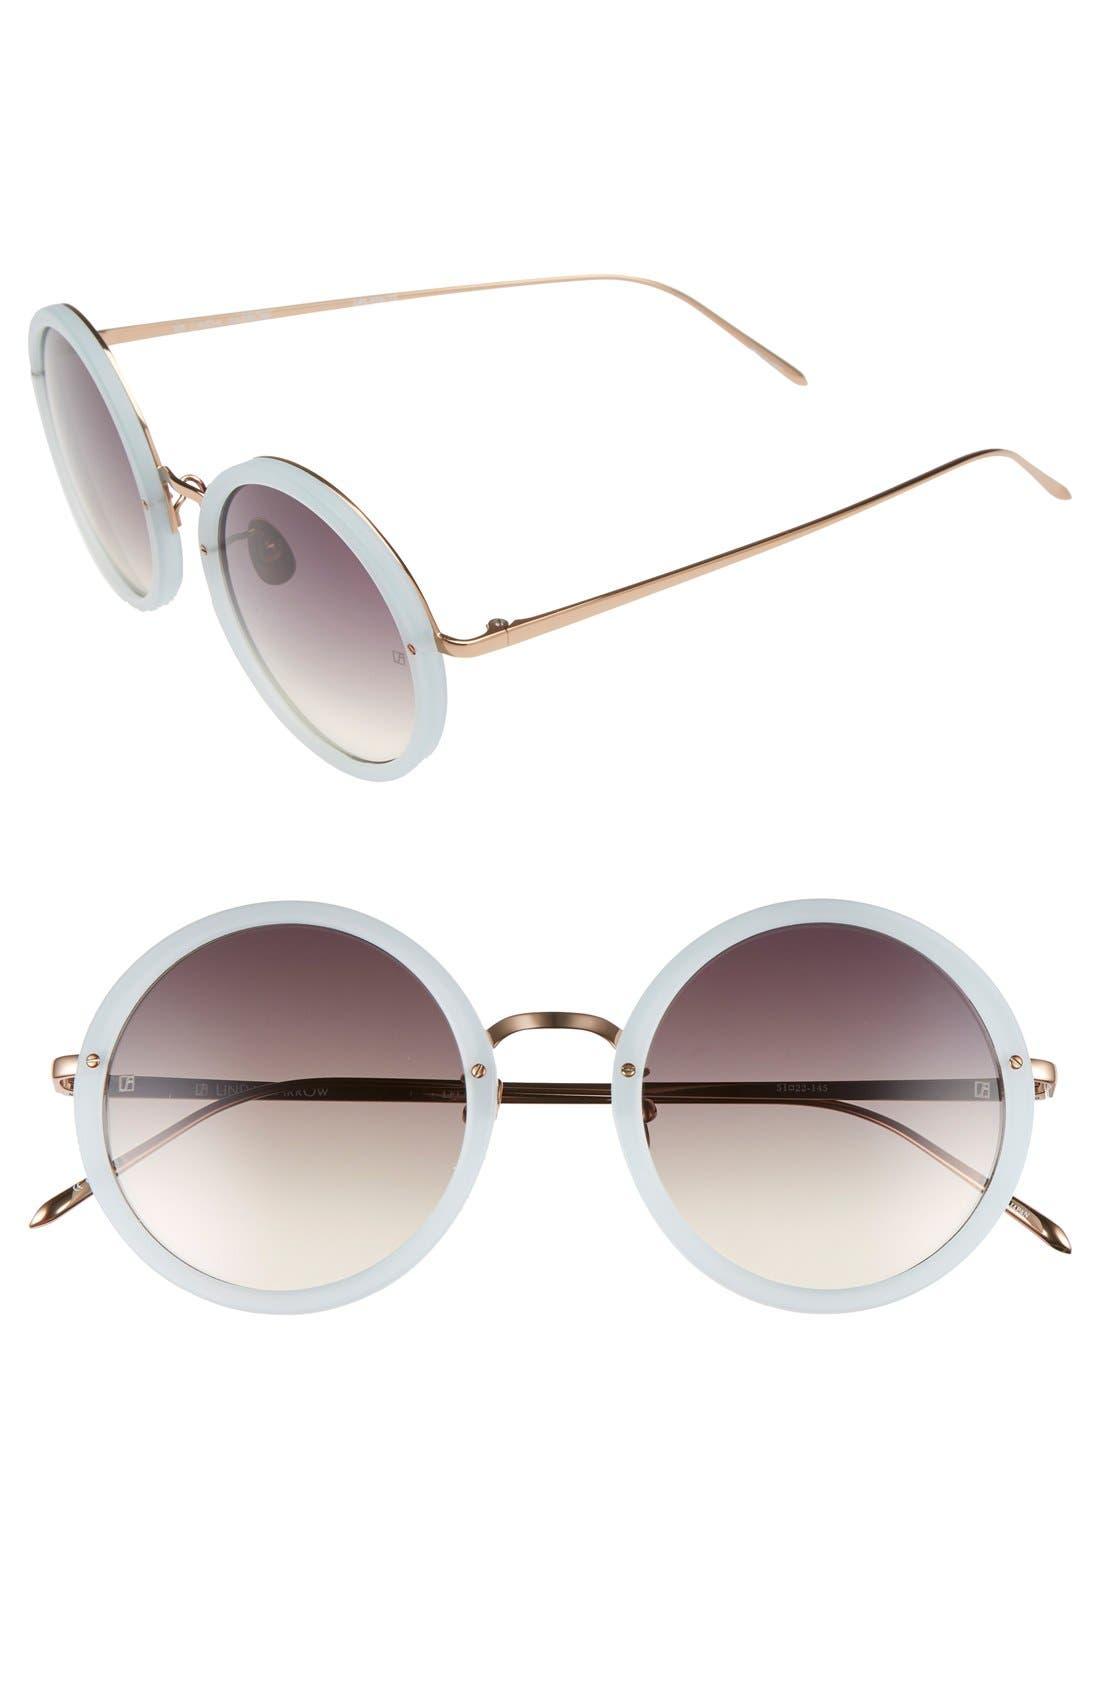 51mm Round 18 Karat Rose Gold Sunglasses,                         Main,                         color,